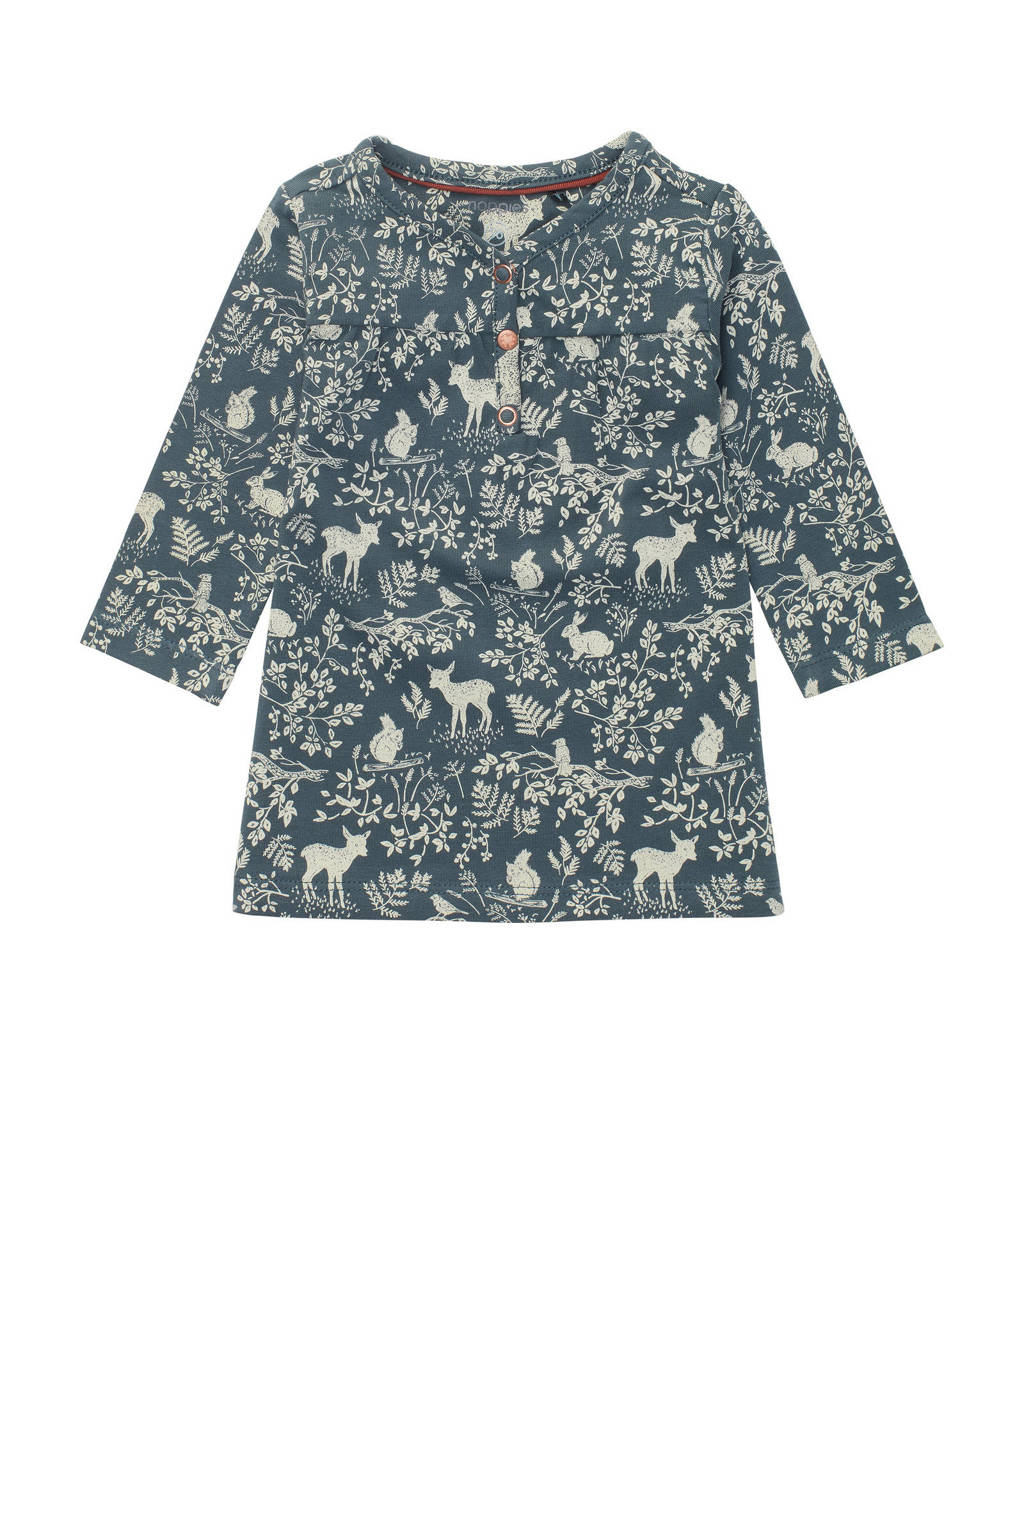 Noppies baby jurk Salisbury met all over print donkergroen, Donkergroen